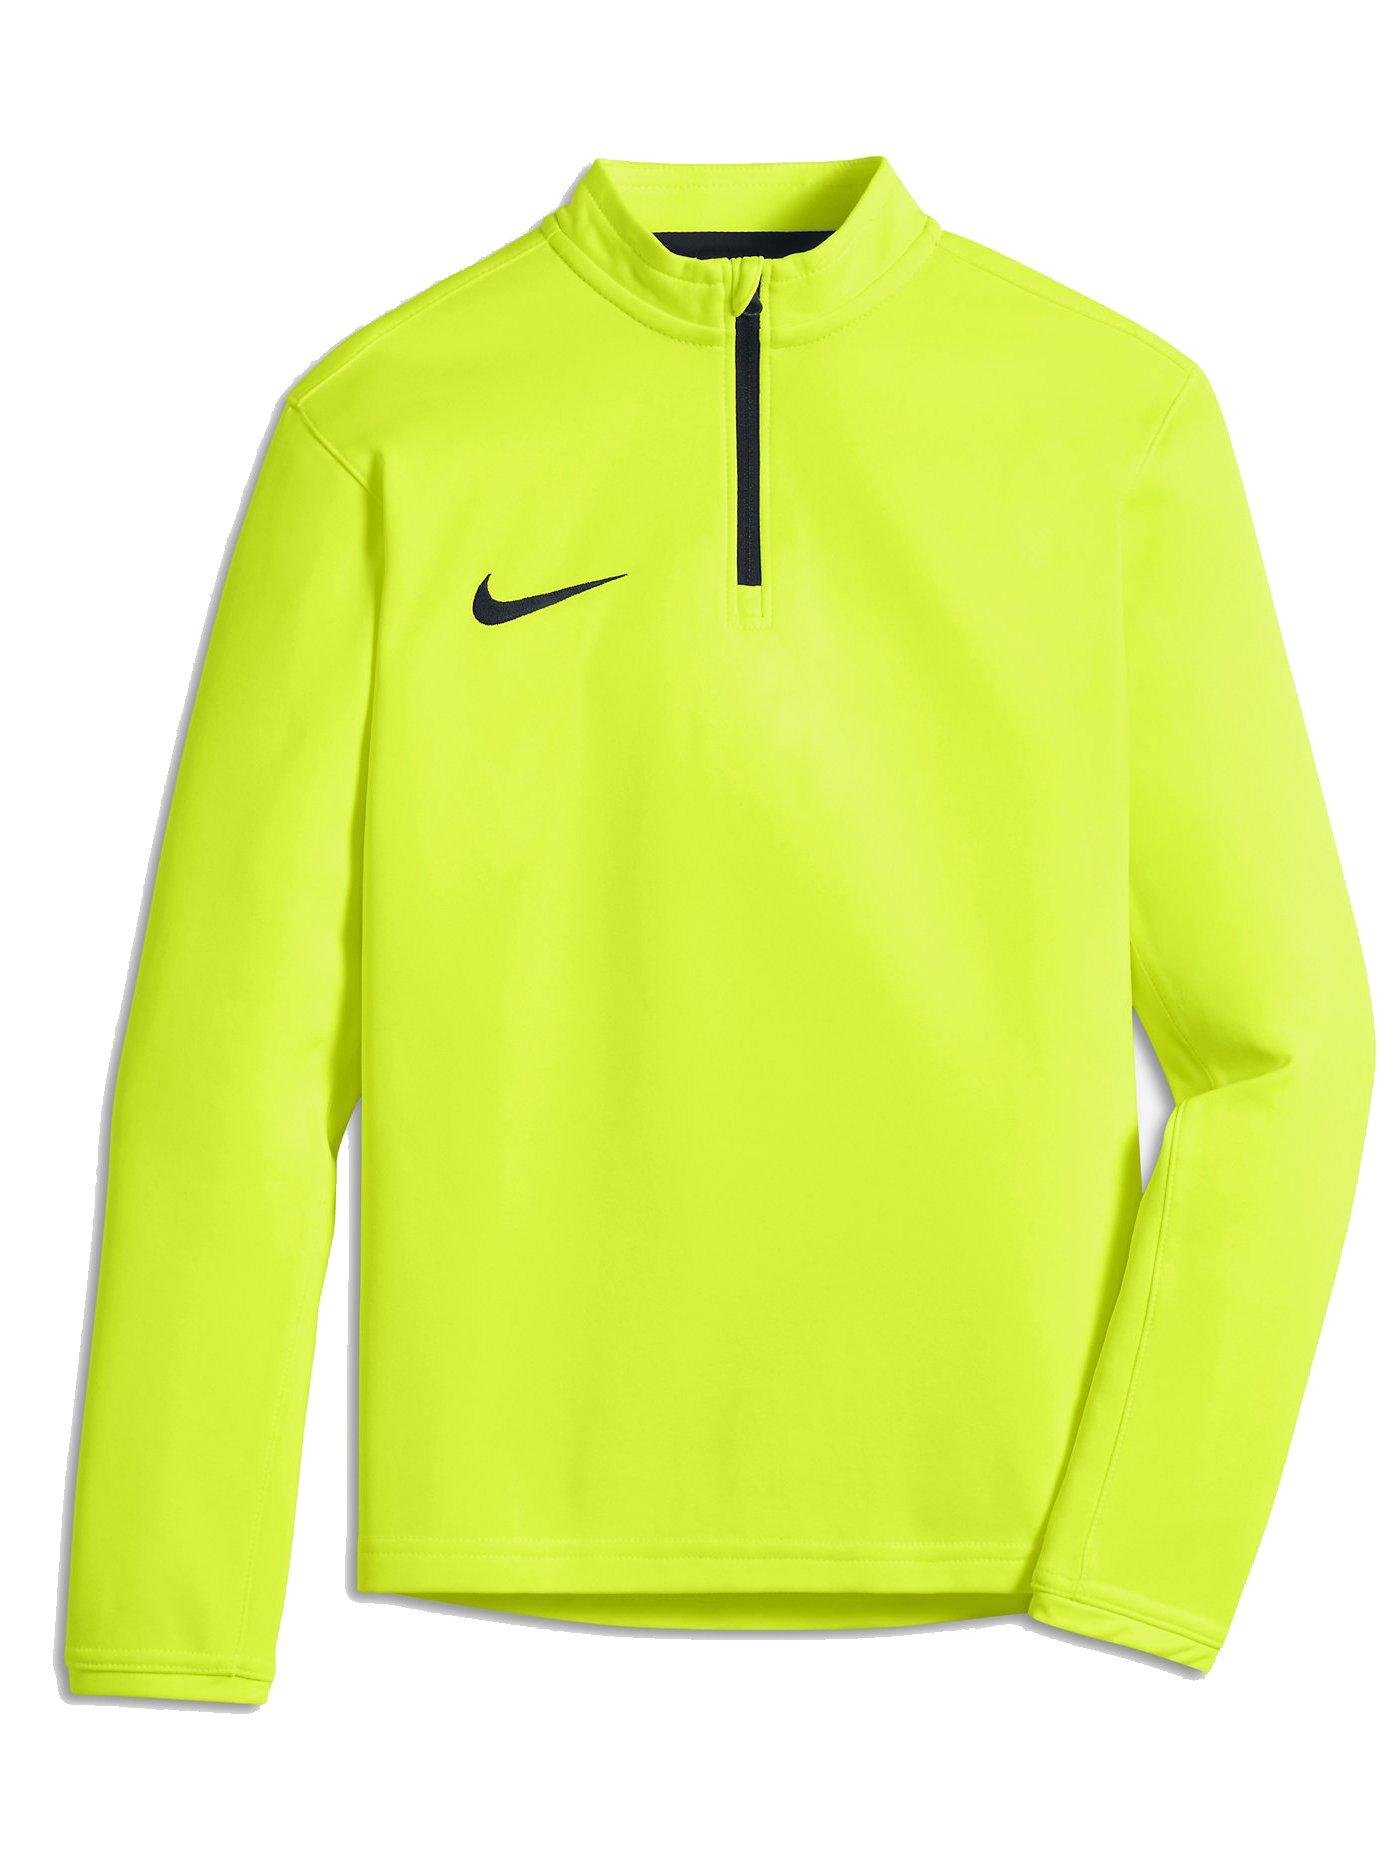 Tréninková mikina Nike Dry Dril